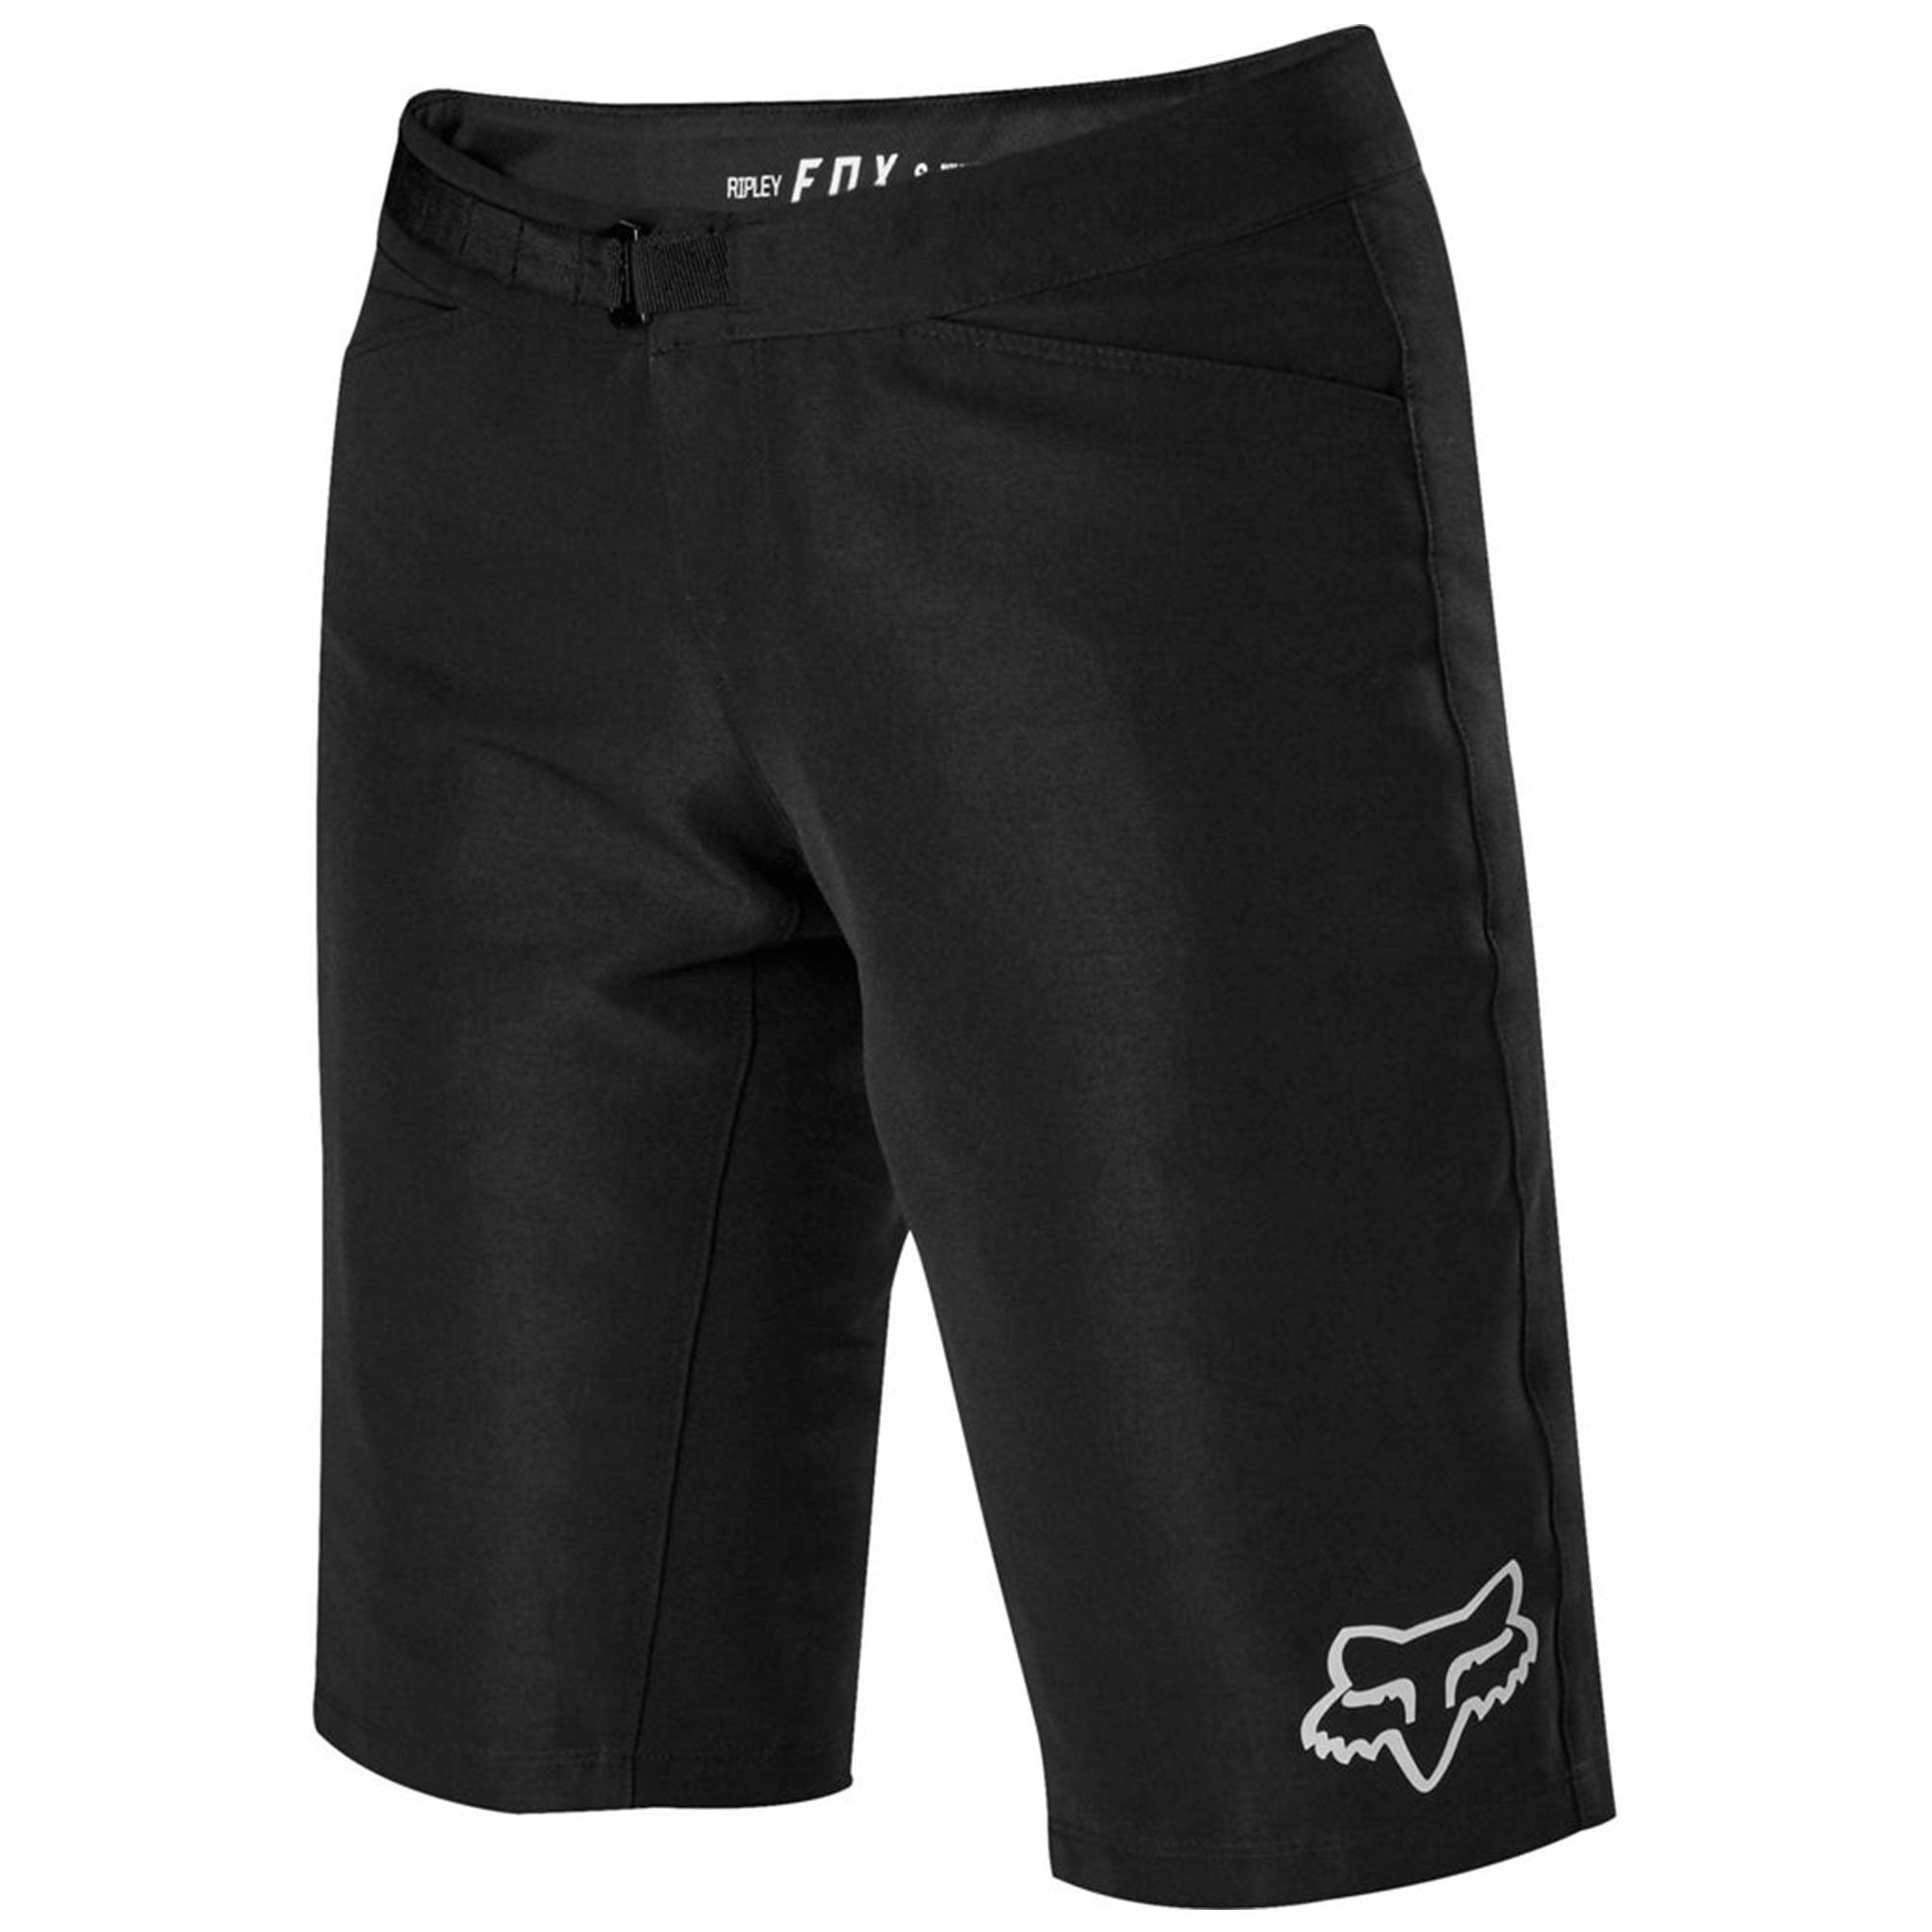 Fox Women's Ranger Cycling Shorts  - Black - Size: Small